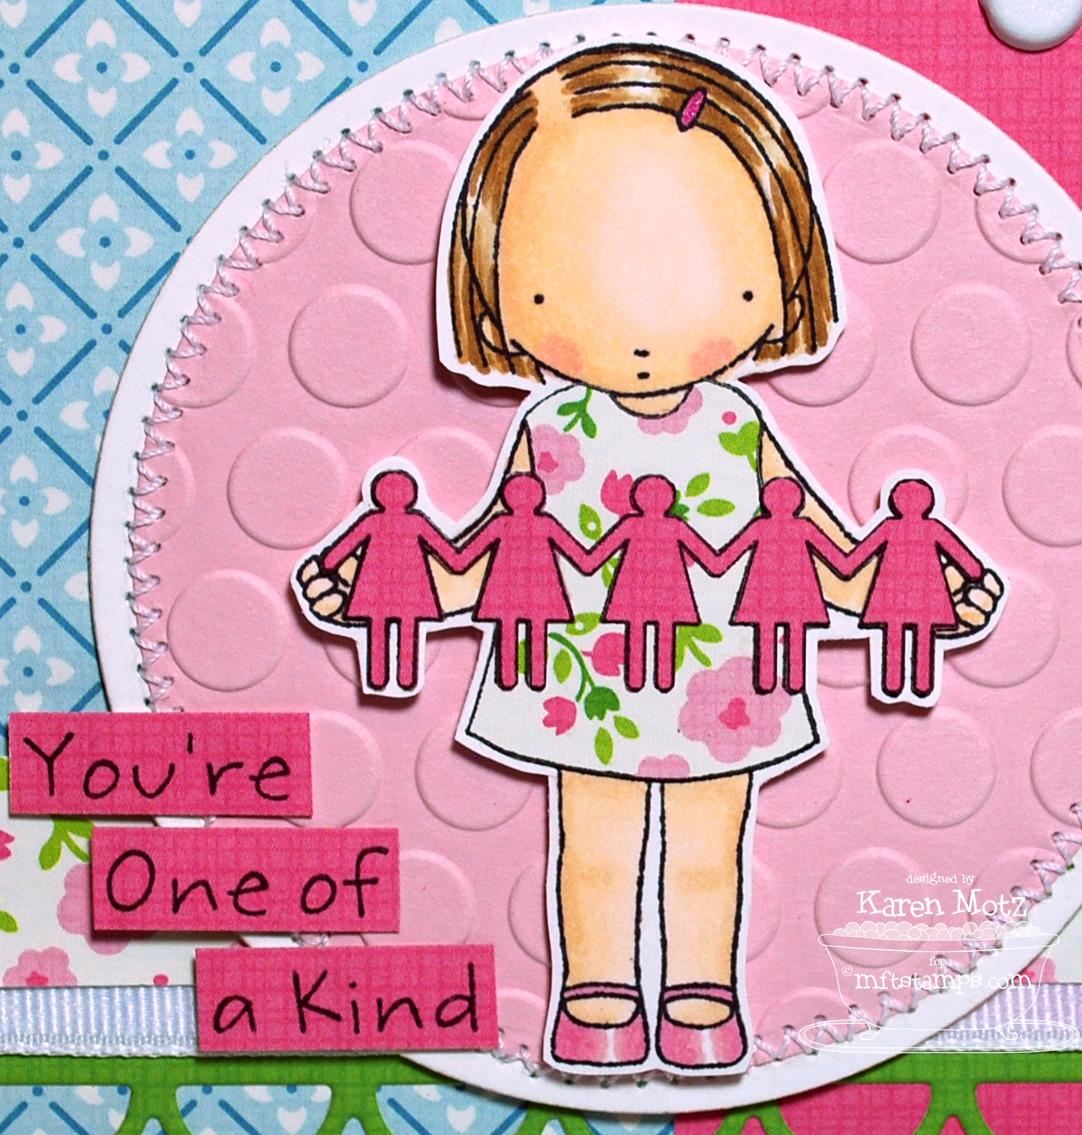 http://2.bp.blogspot.com/-NWSBo3pkkAU/T1q7vHyLAkI/AAAAAAAAH2s/2SOk3BLf1ok/s1600/One-of-a-Kind-detail.jpg